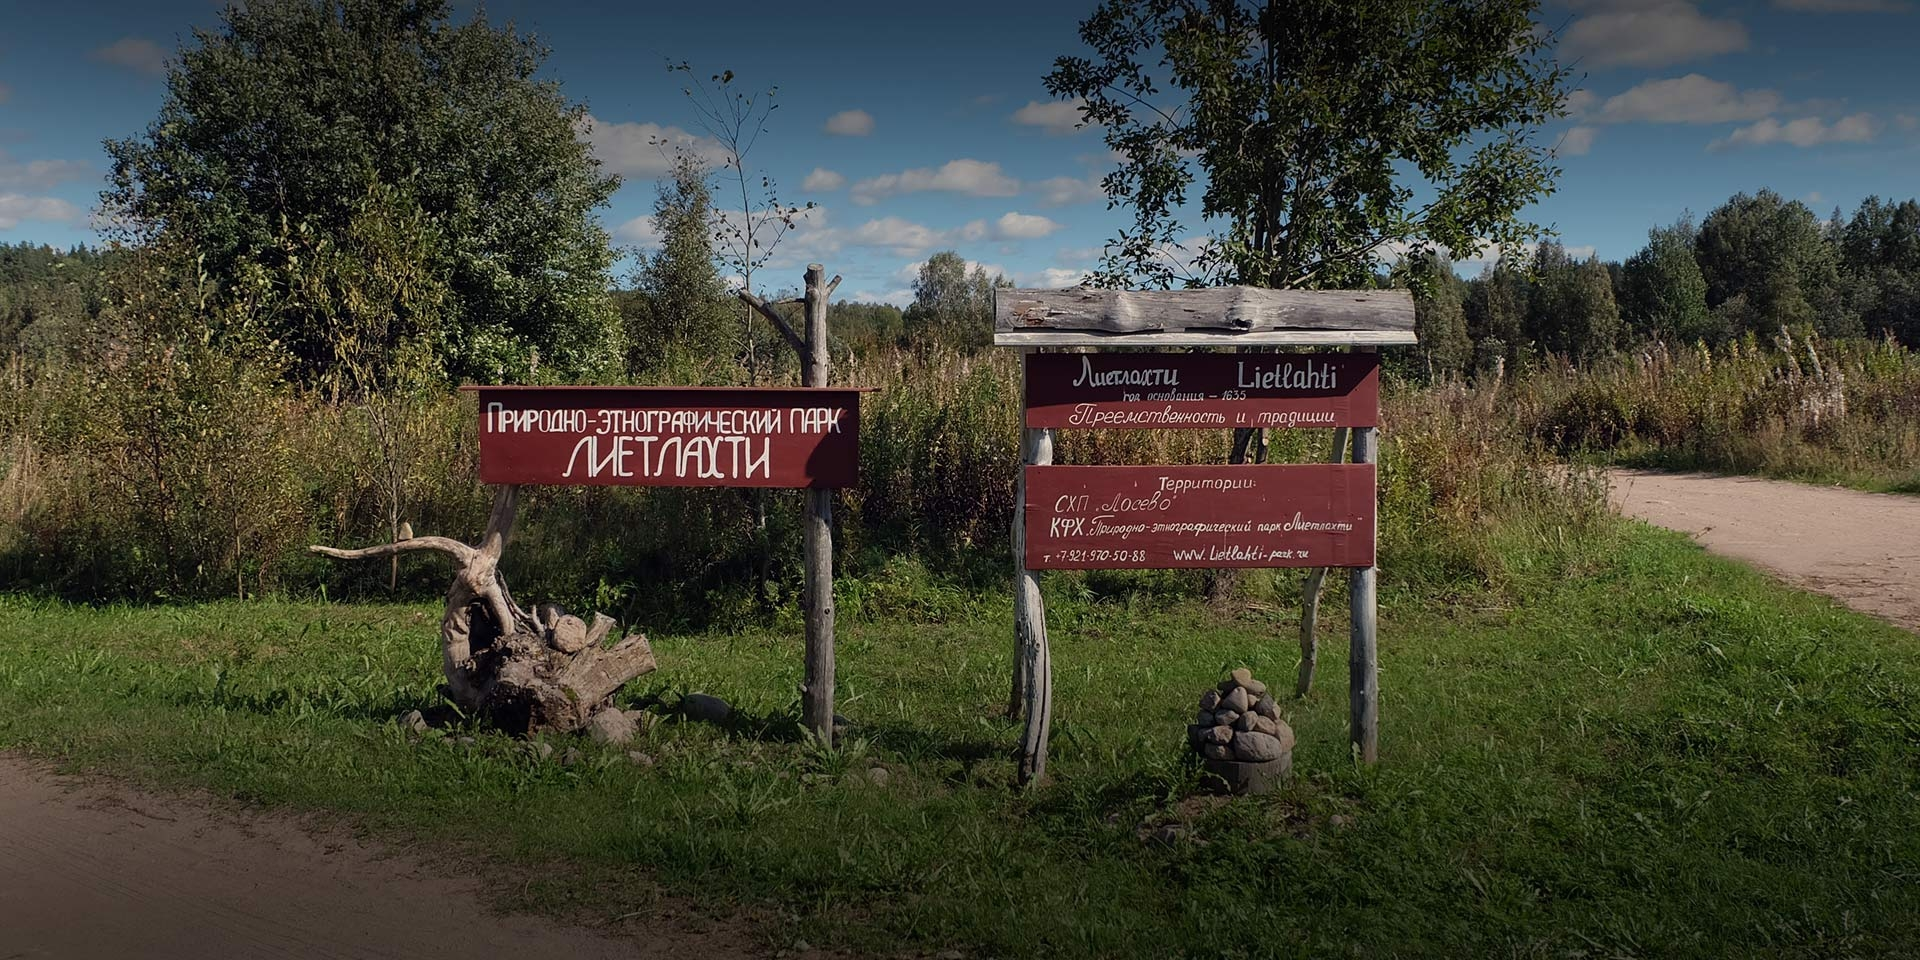 Лиетлахти парк — 2016